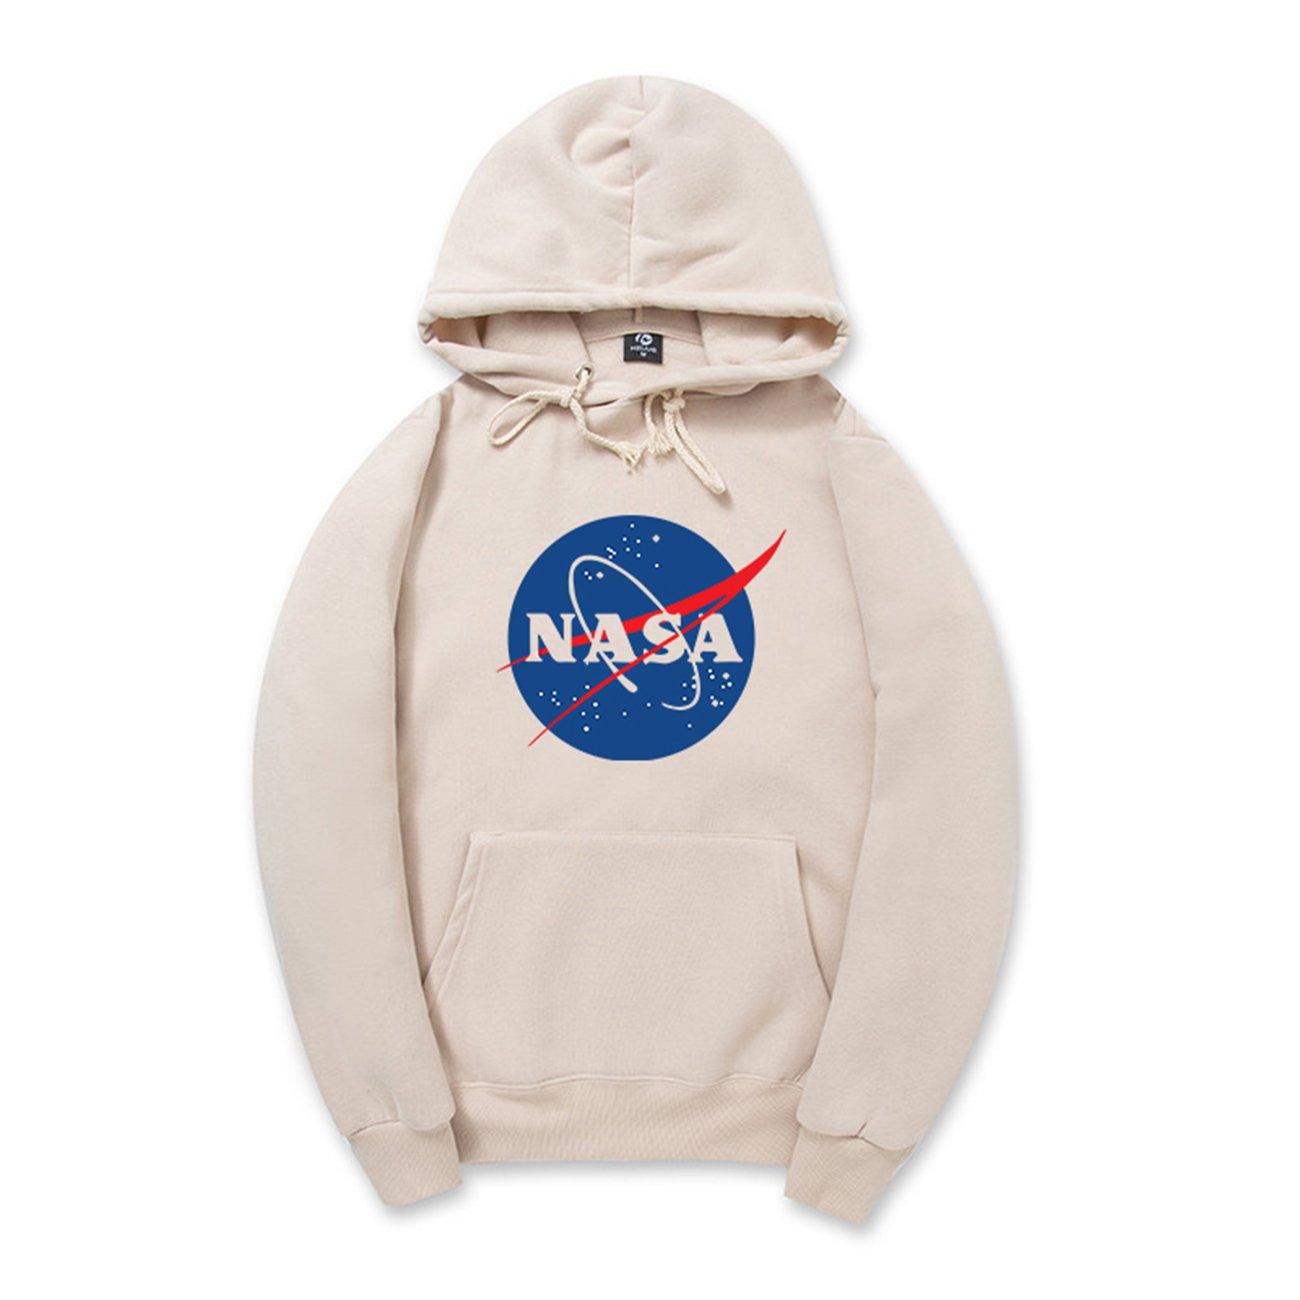 2_apricot Coli&Tori Fashion NASA Logo Print Hoodie Sweatshirt with Kangaroo Pocket(Smaller Than Standard Size)